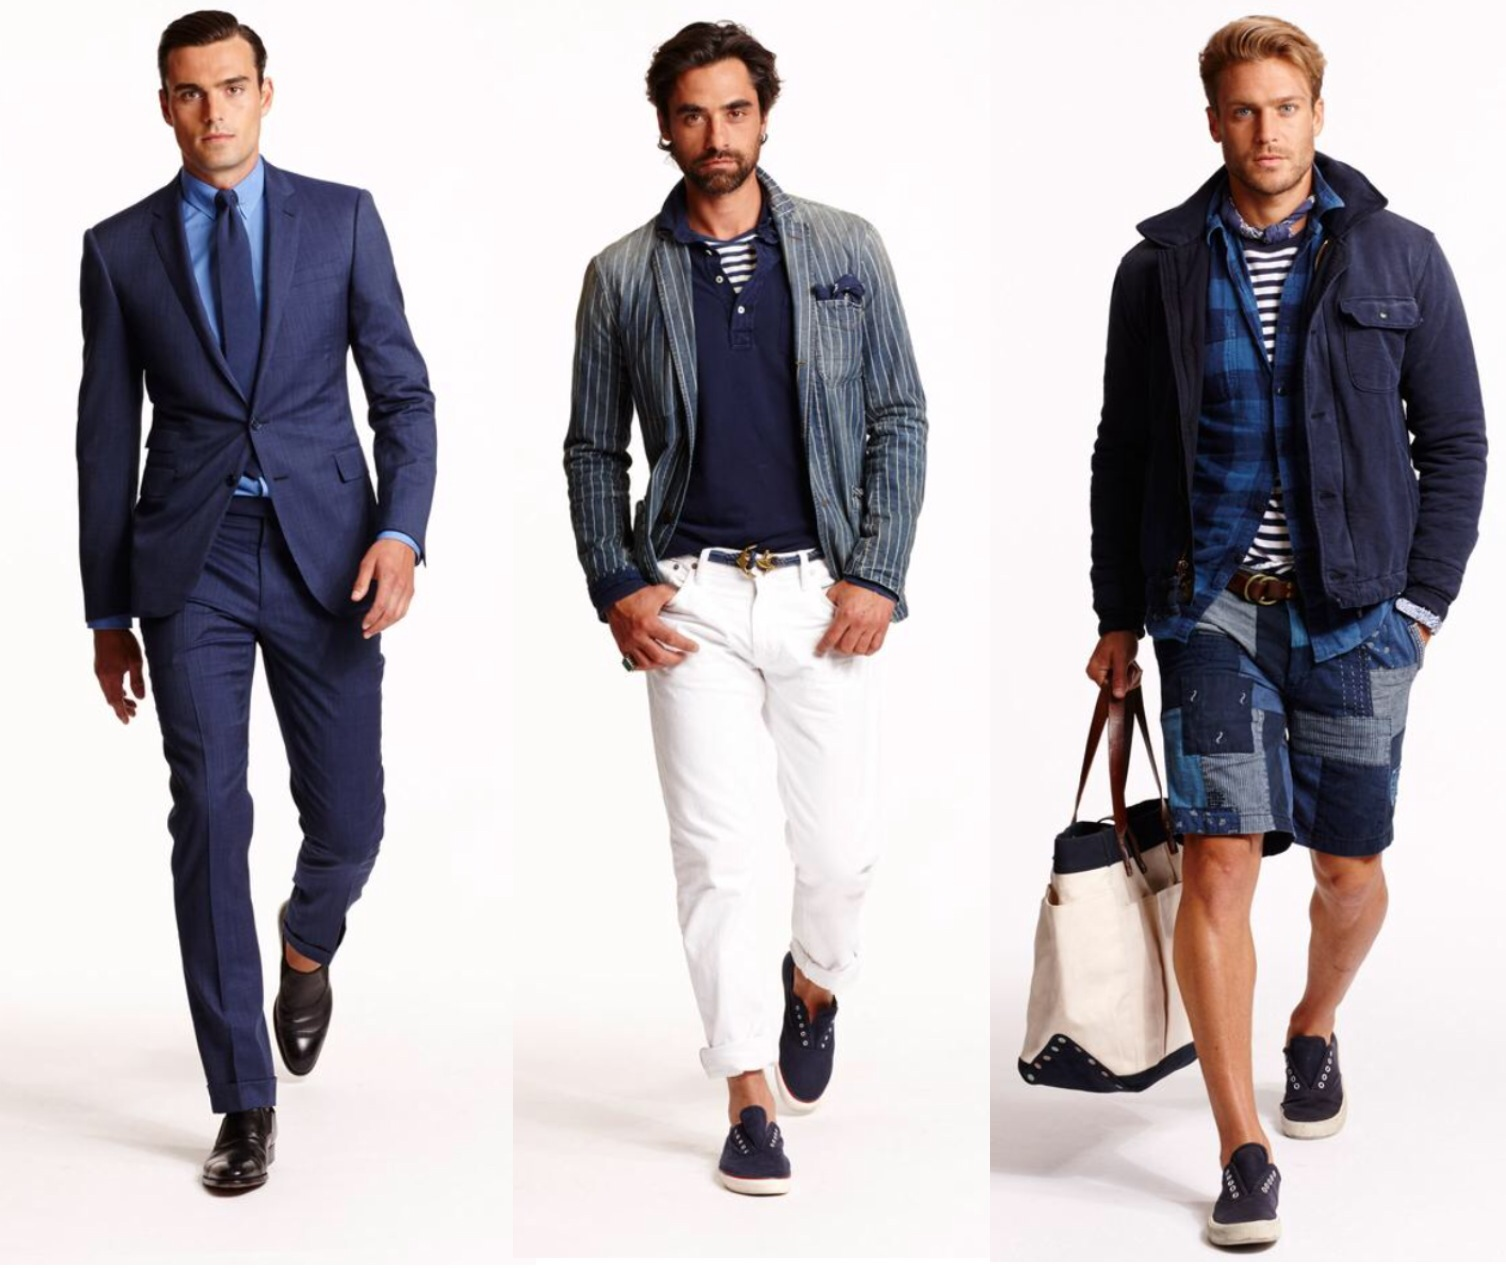 69c4307ef6c Choose Cloths Men s Fashion Summer 2016